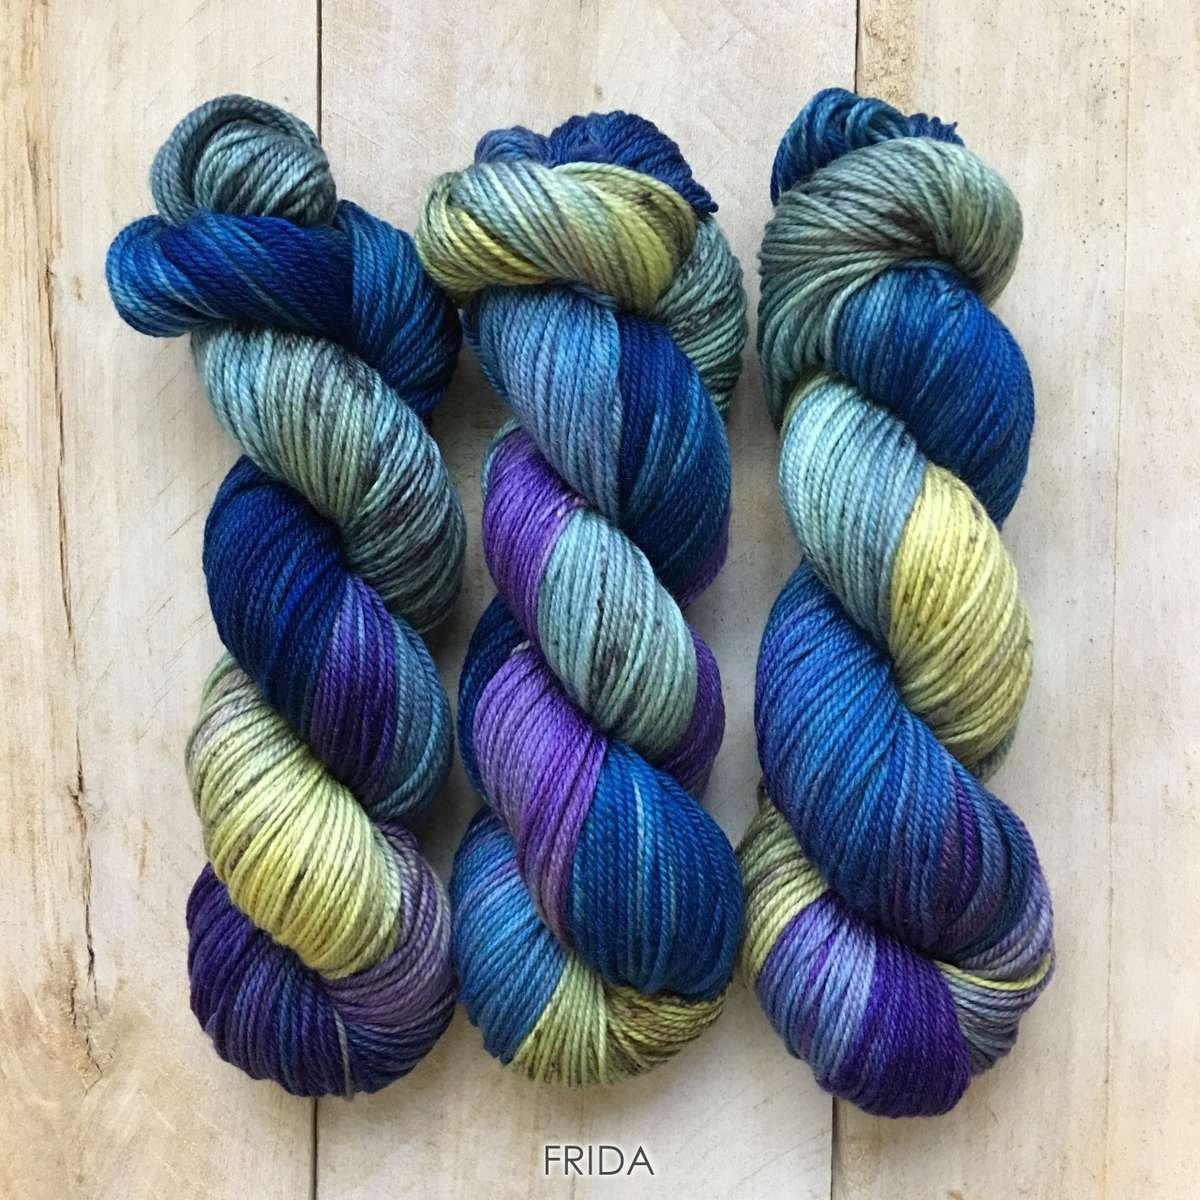 Hand-dyed yarn Louise Robert Frida